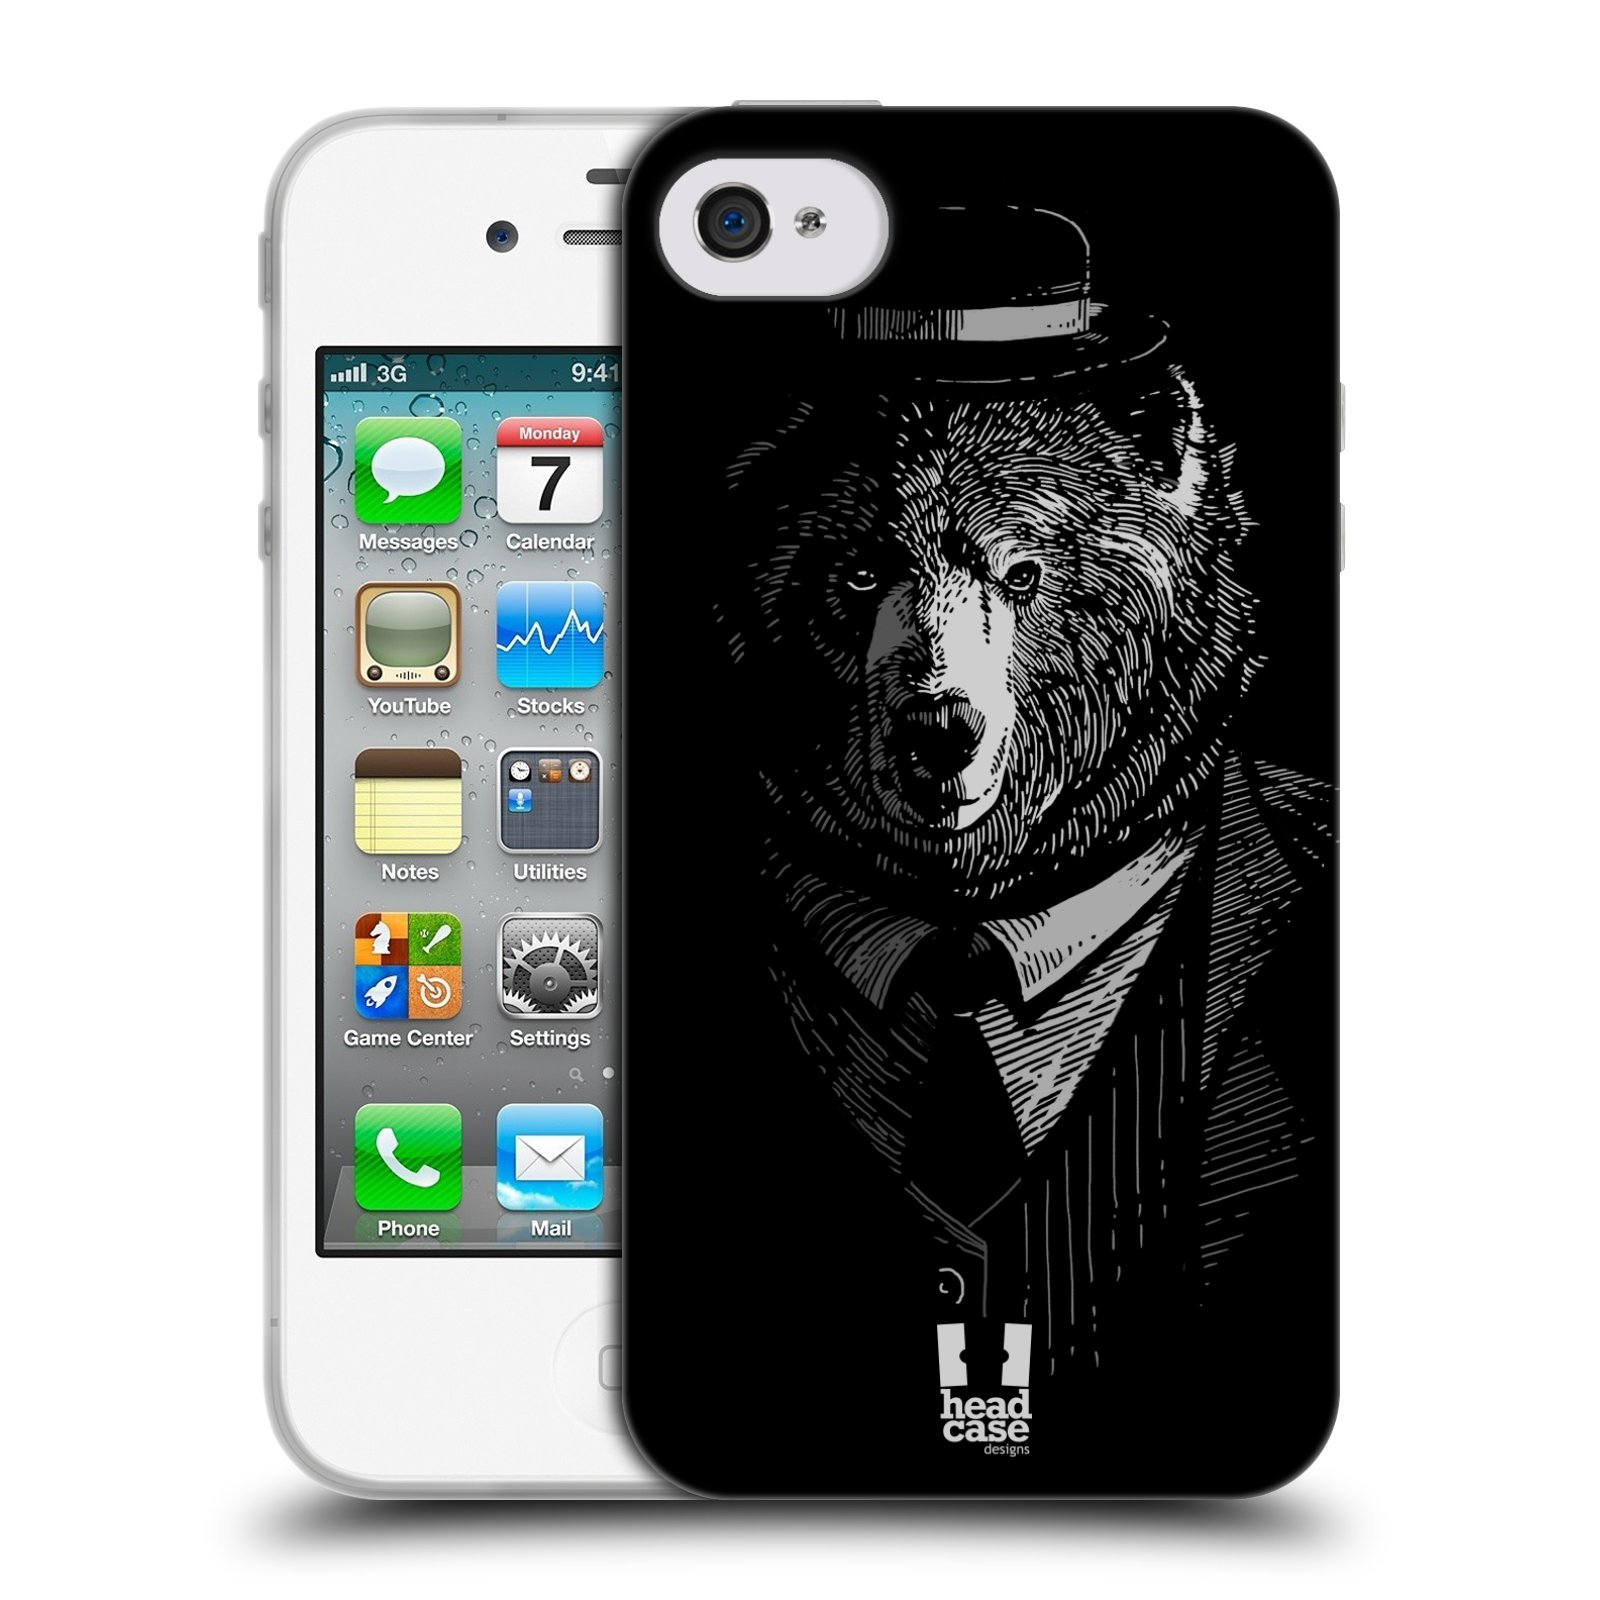 Silikonové pouzdro na mobil Apple iPhone 4 a 4S HEAD CASE MEDVĚD V KVÁDRU (Silikonový kryt či obal na mobilní telefon Apple iPhone 4 a 4S)